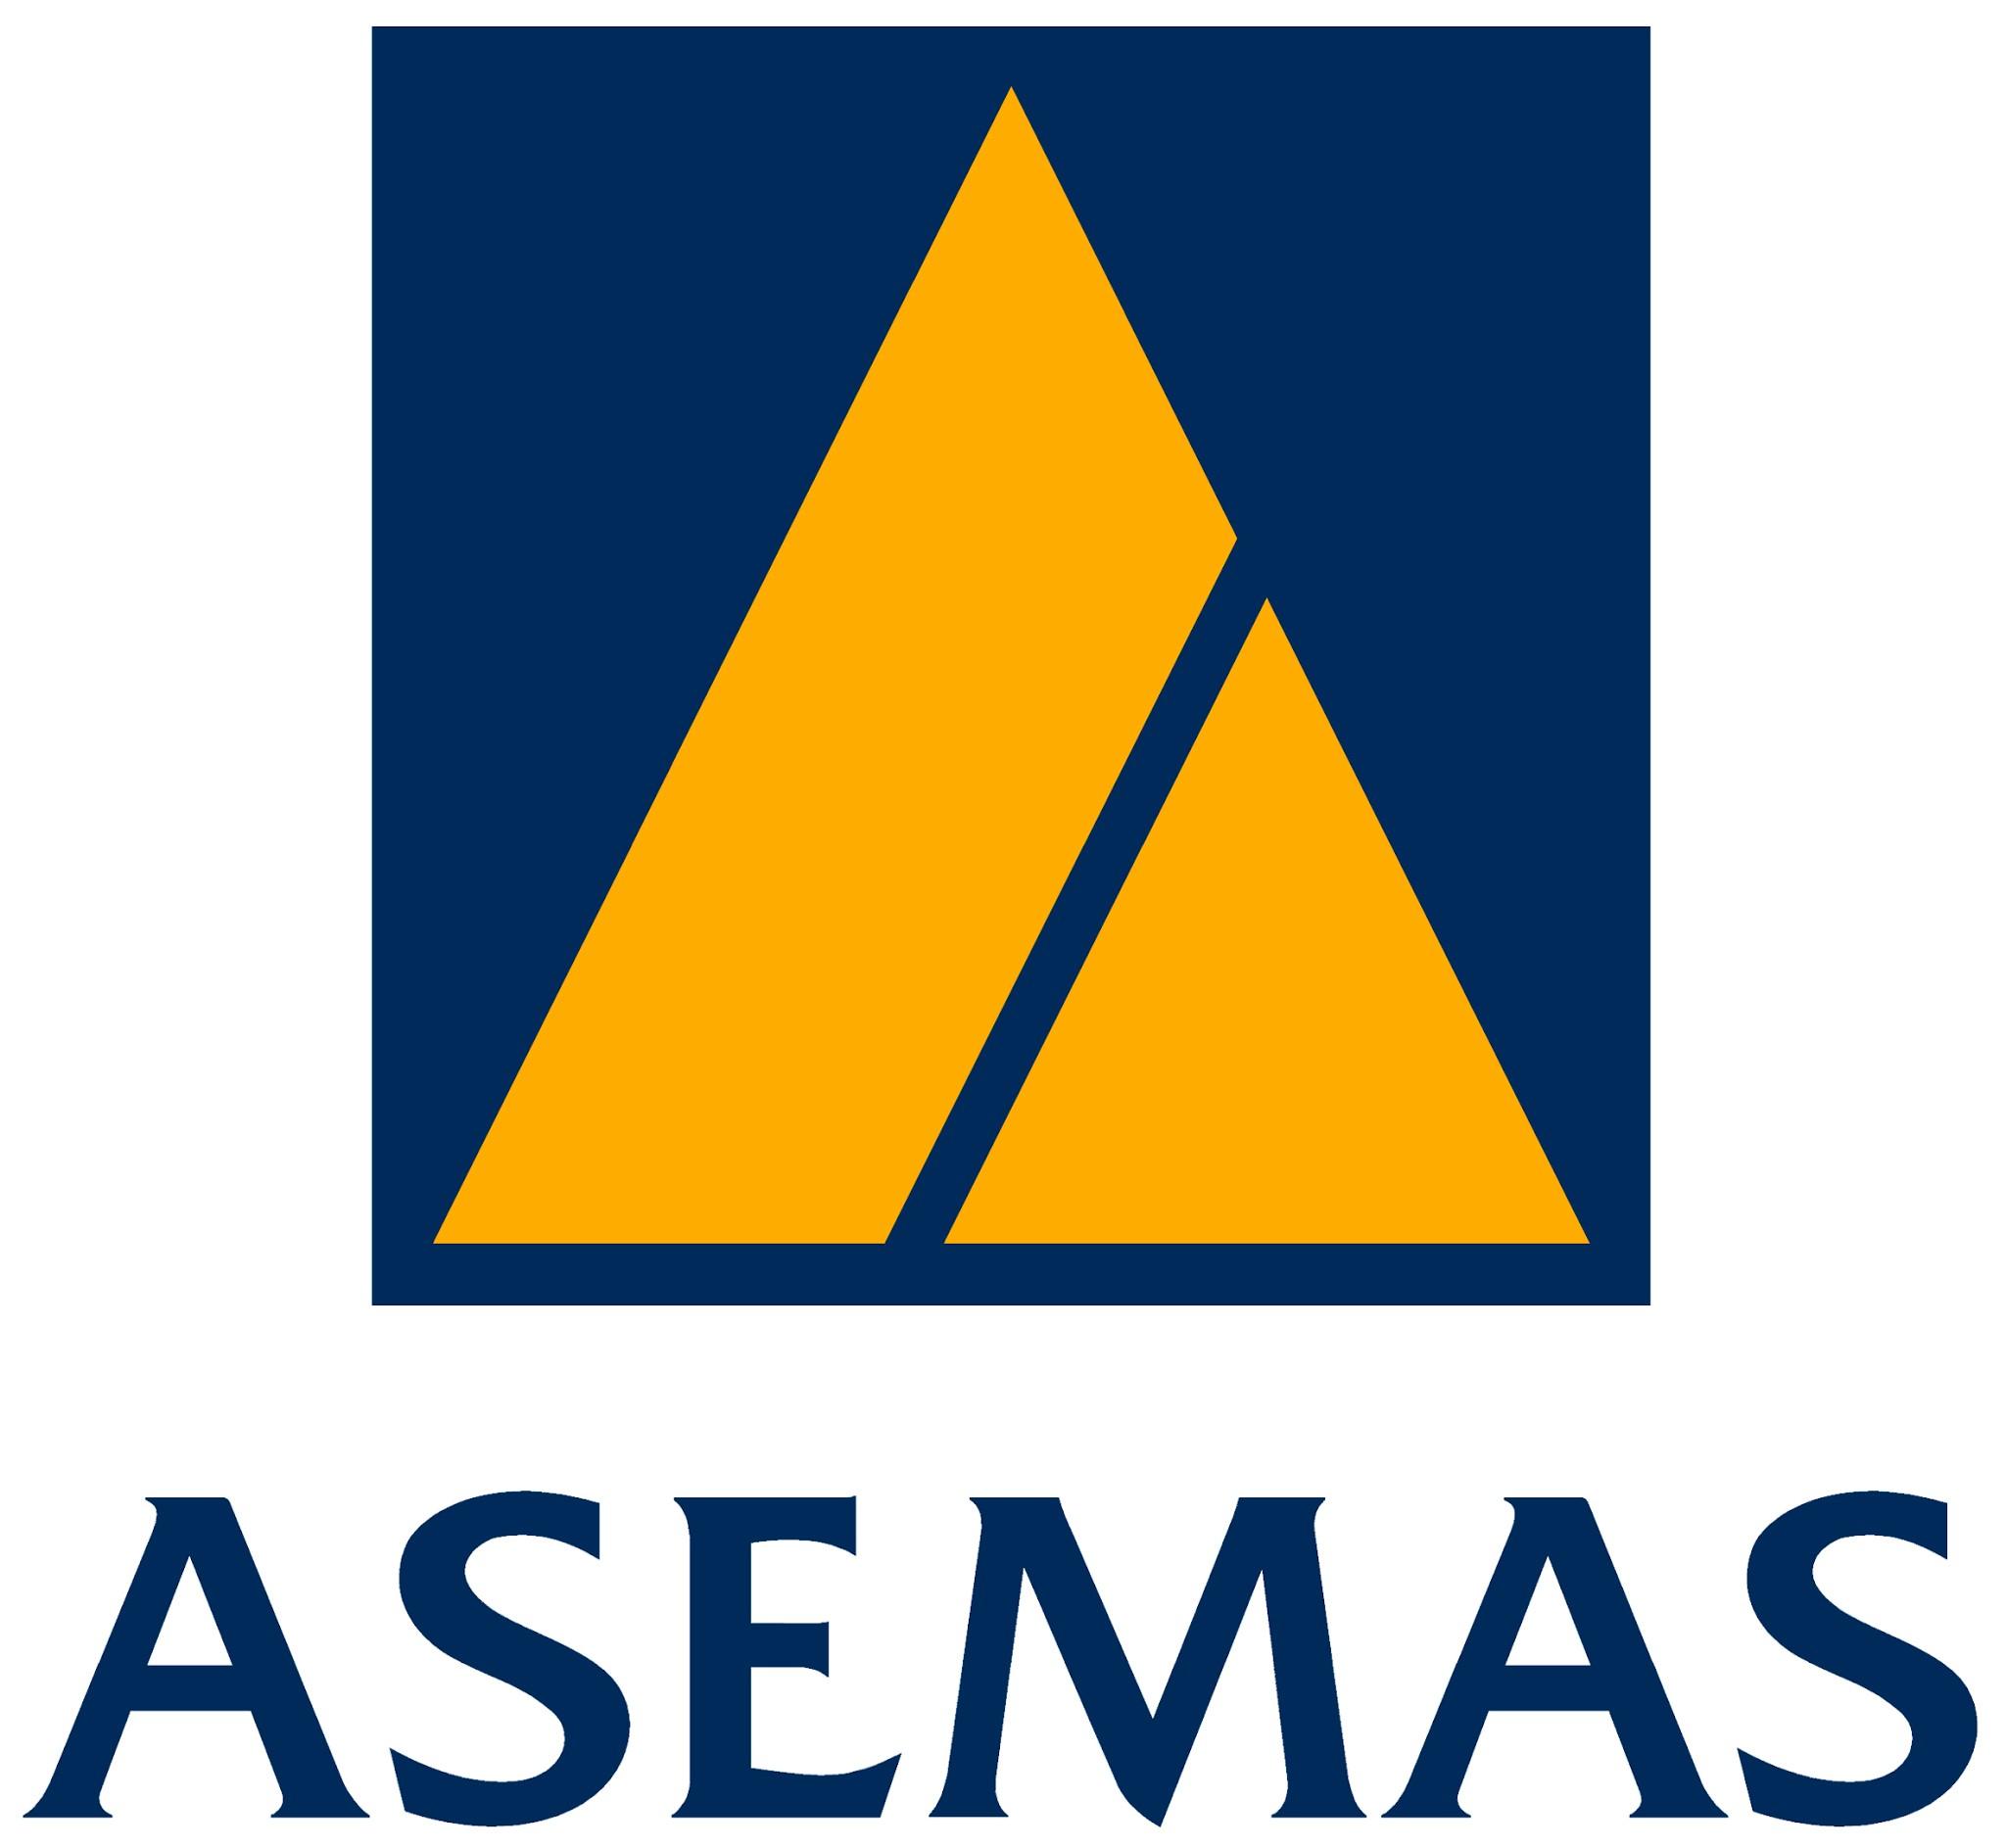 Asemas logo Yellow triangle on Blue square